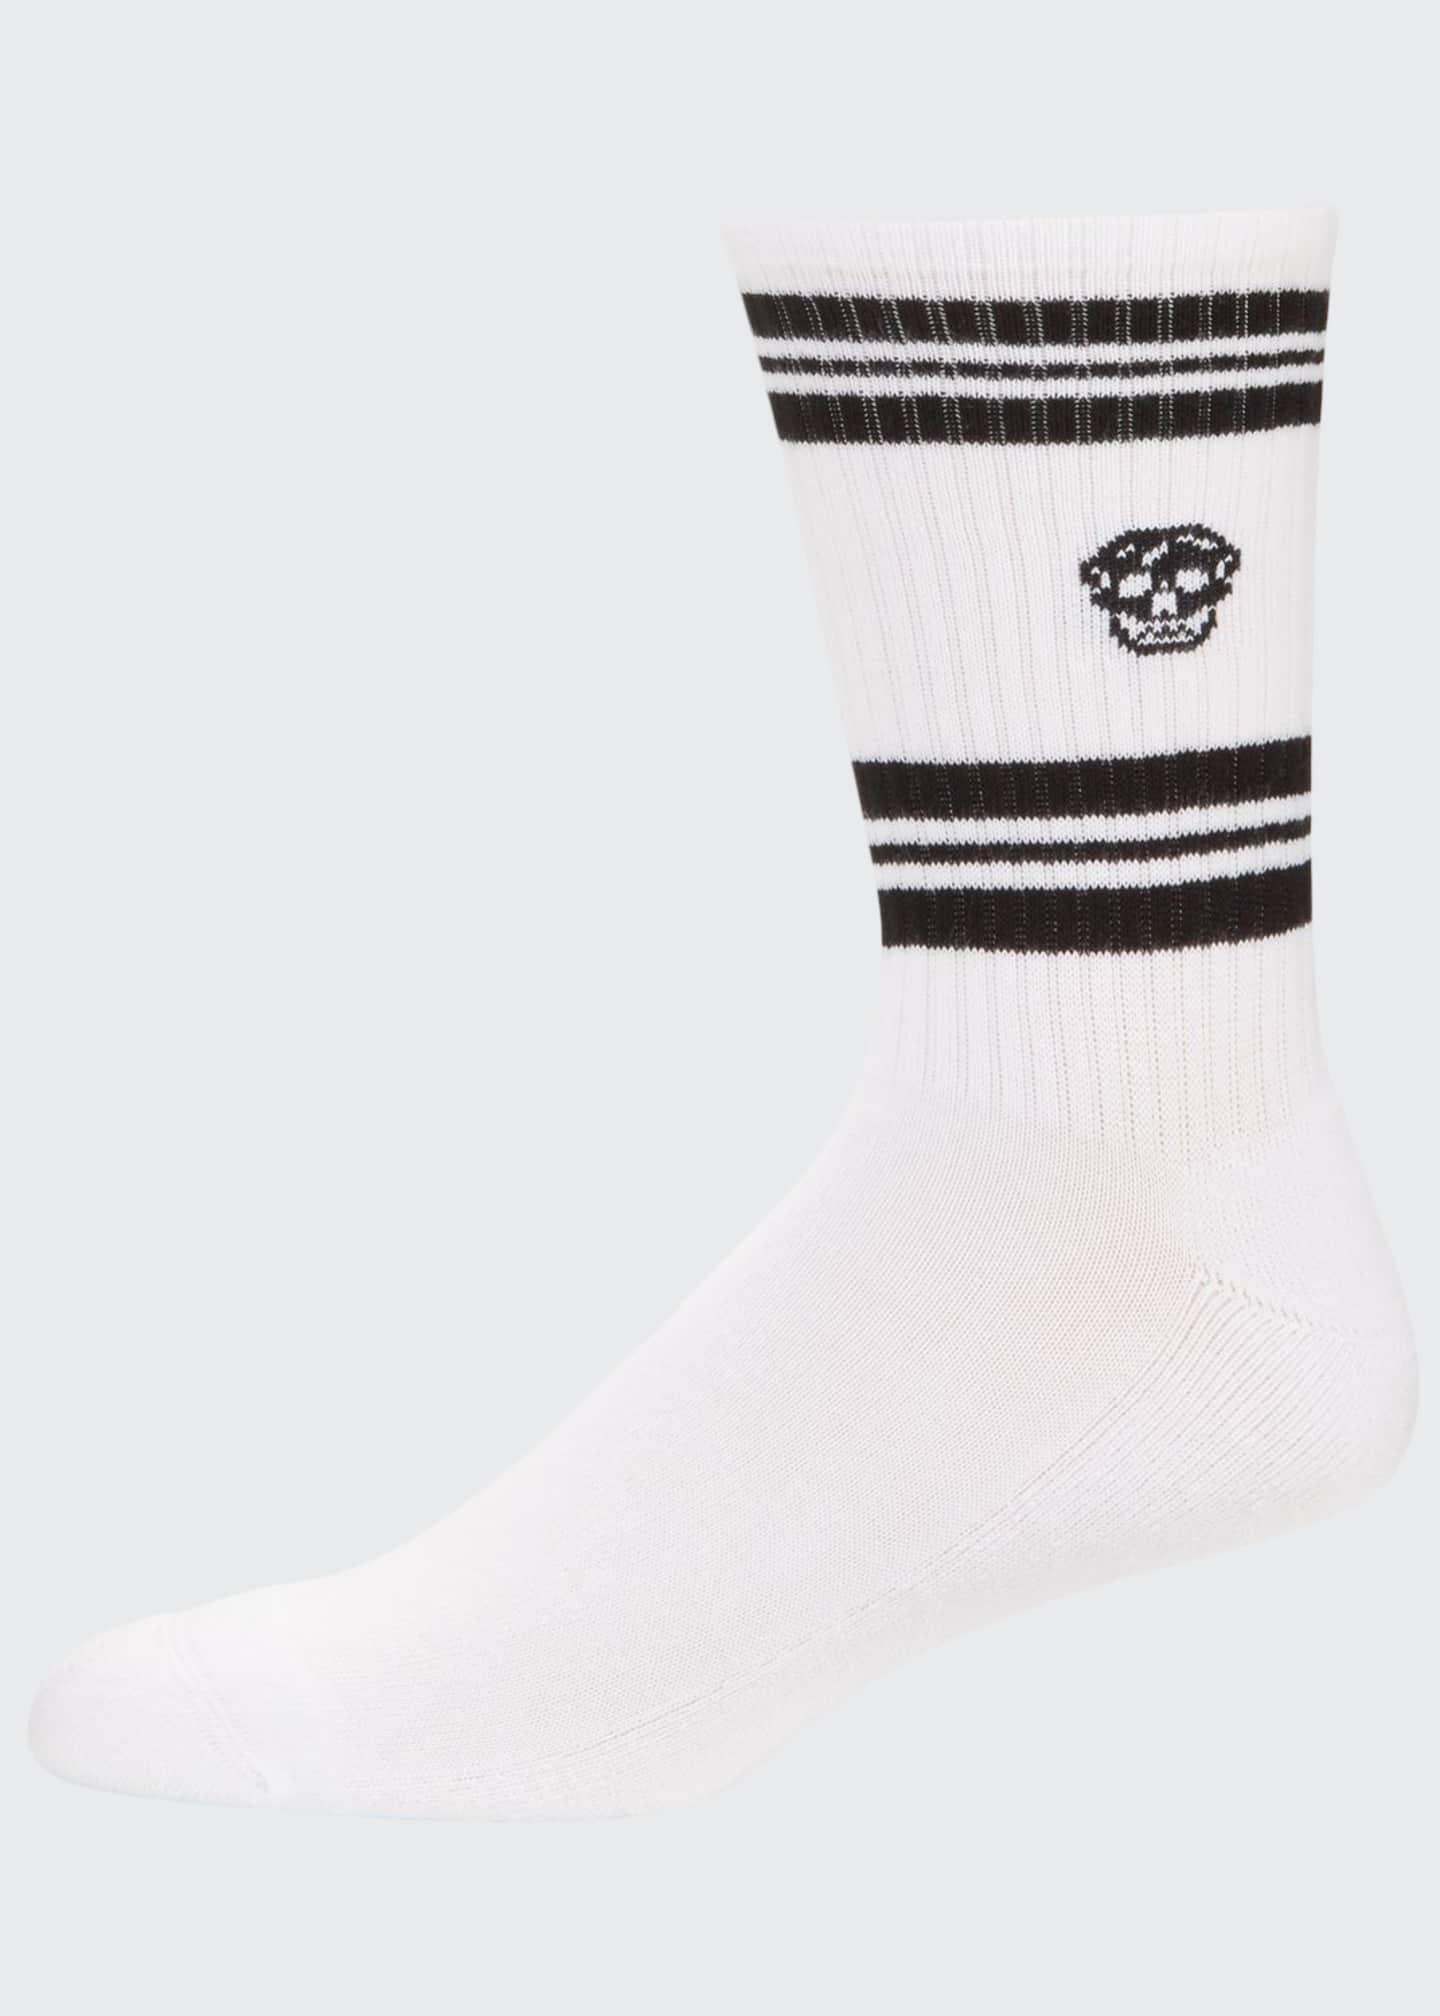 Alexander McQueen Men's Striped Skull Socks